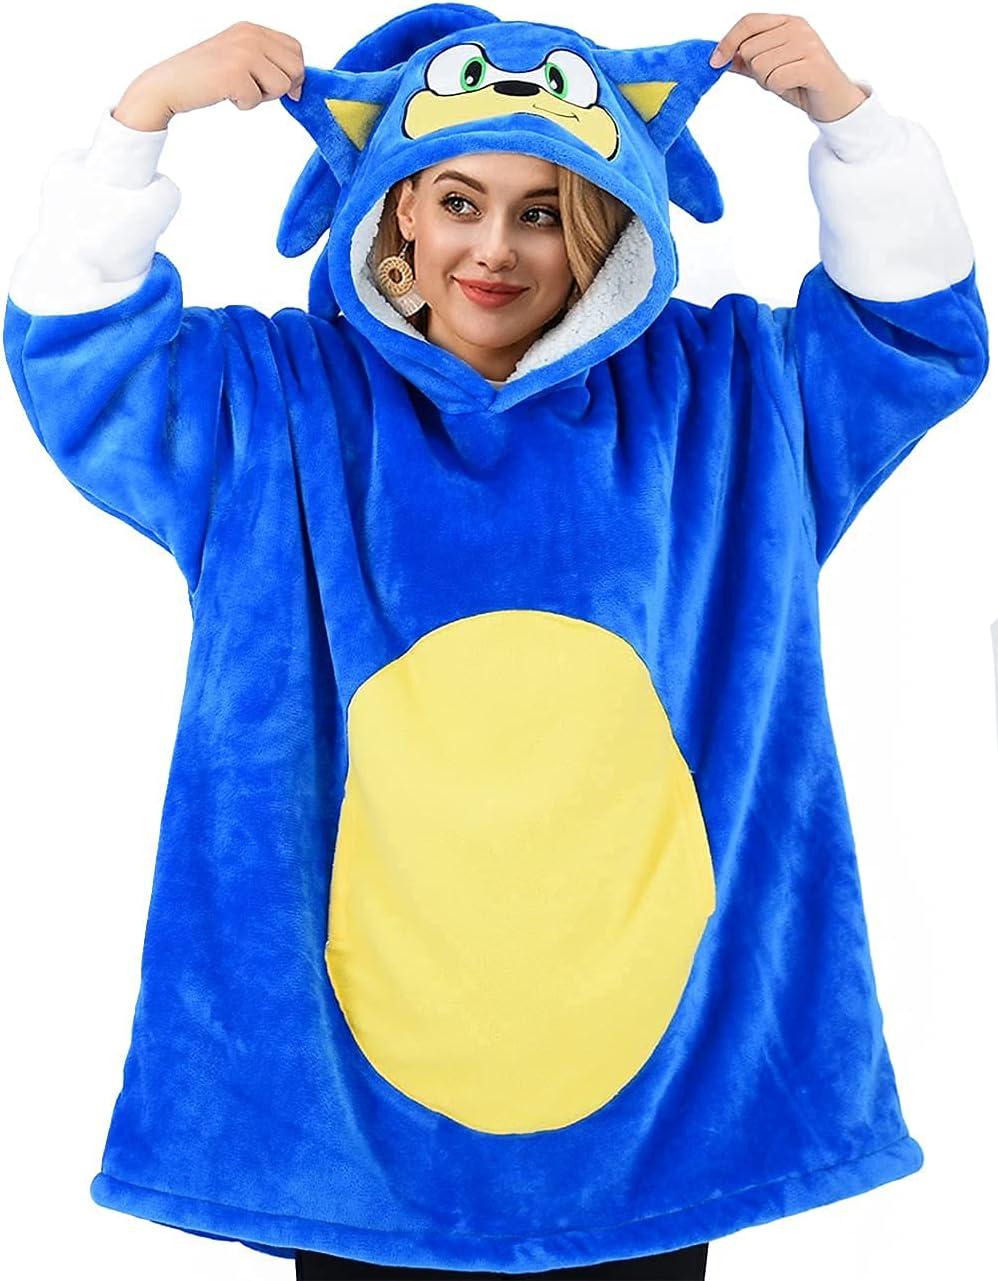 LZBXBXDA Sonic Wearable Blanket Sweatshirt Sherpa We OFFer at cheap prices 1 year warranty Oversized Hood